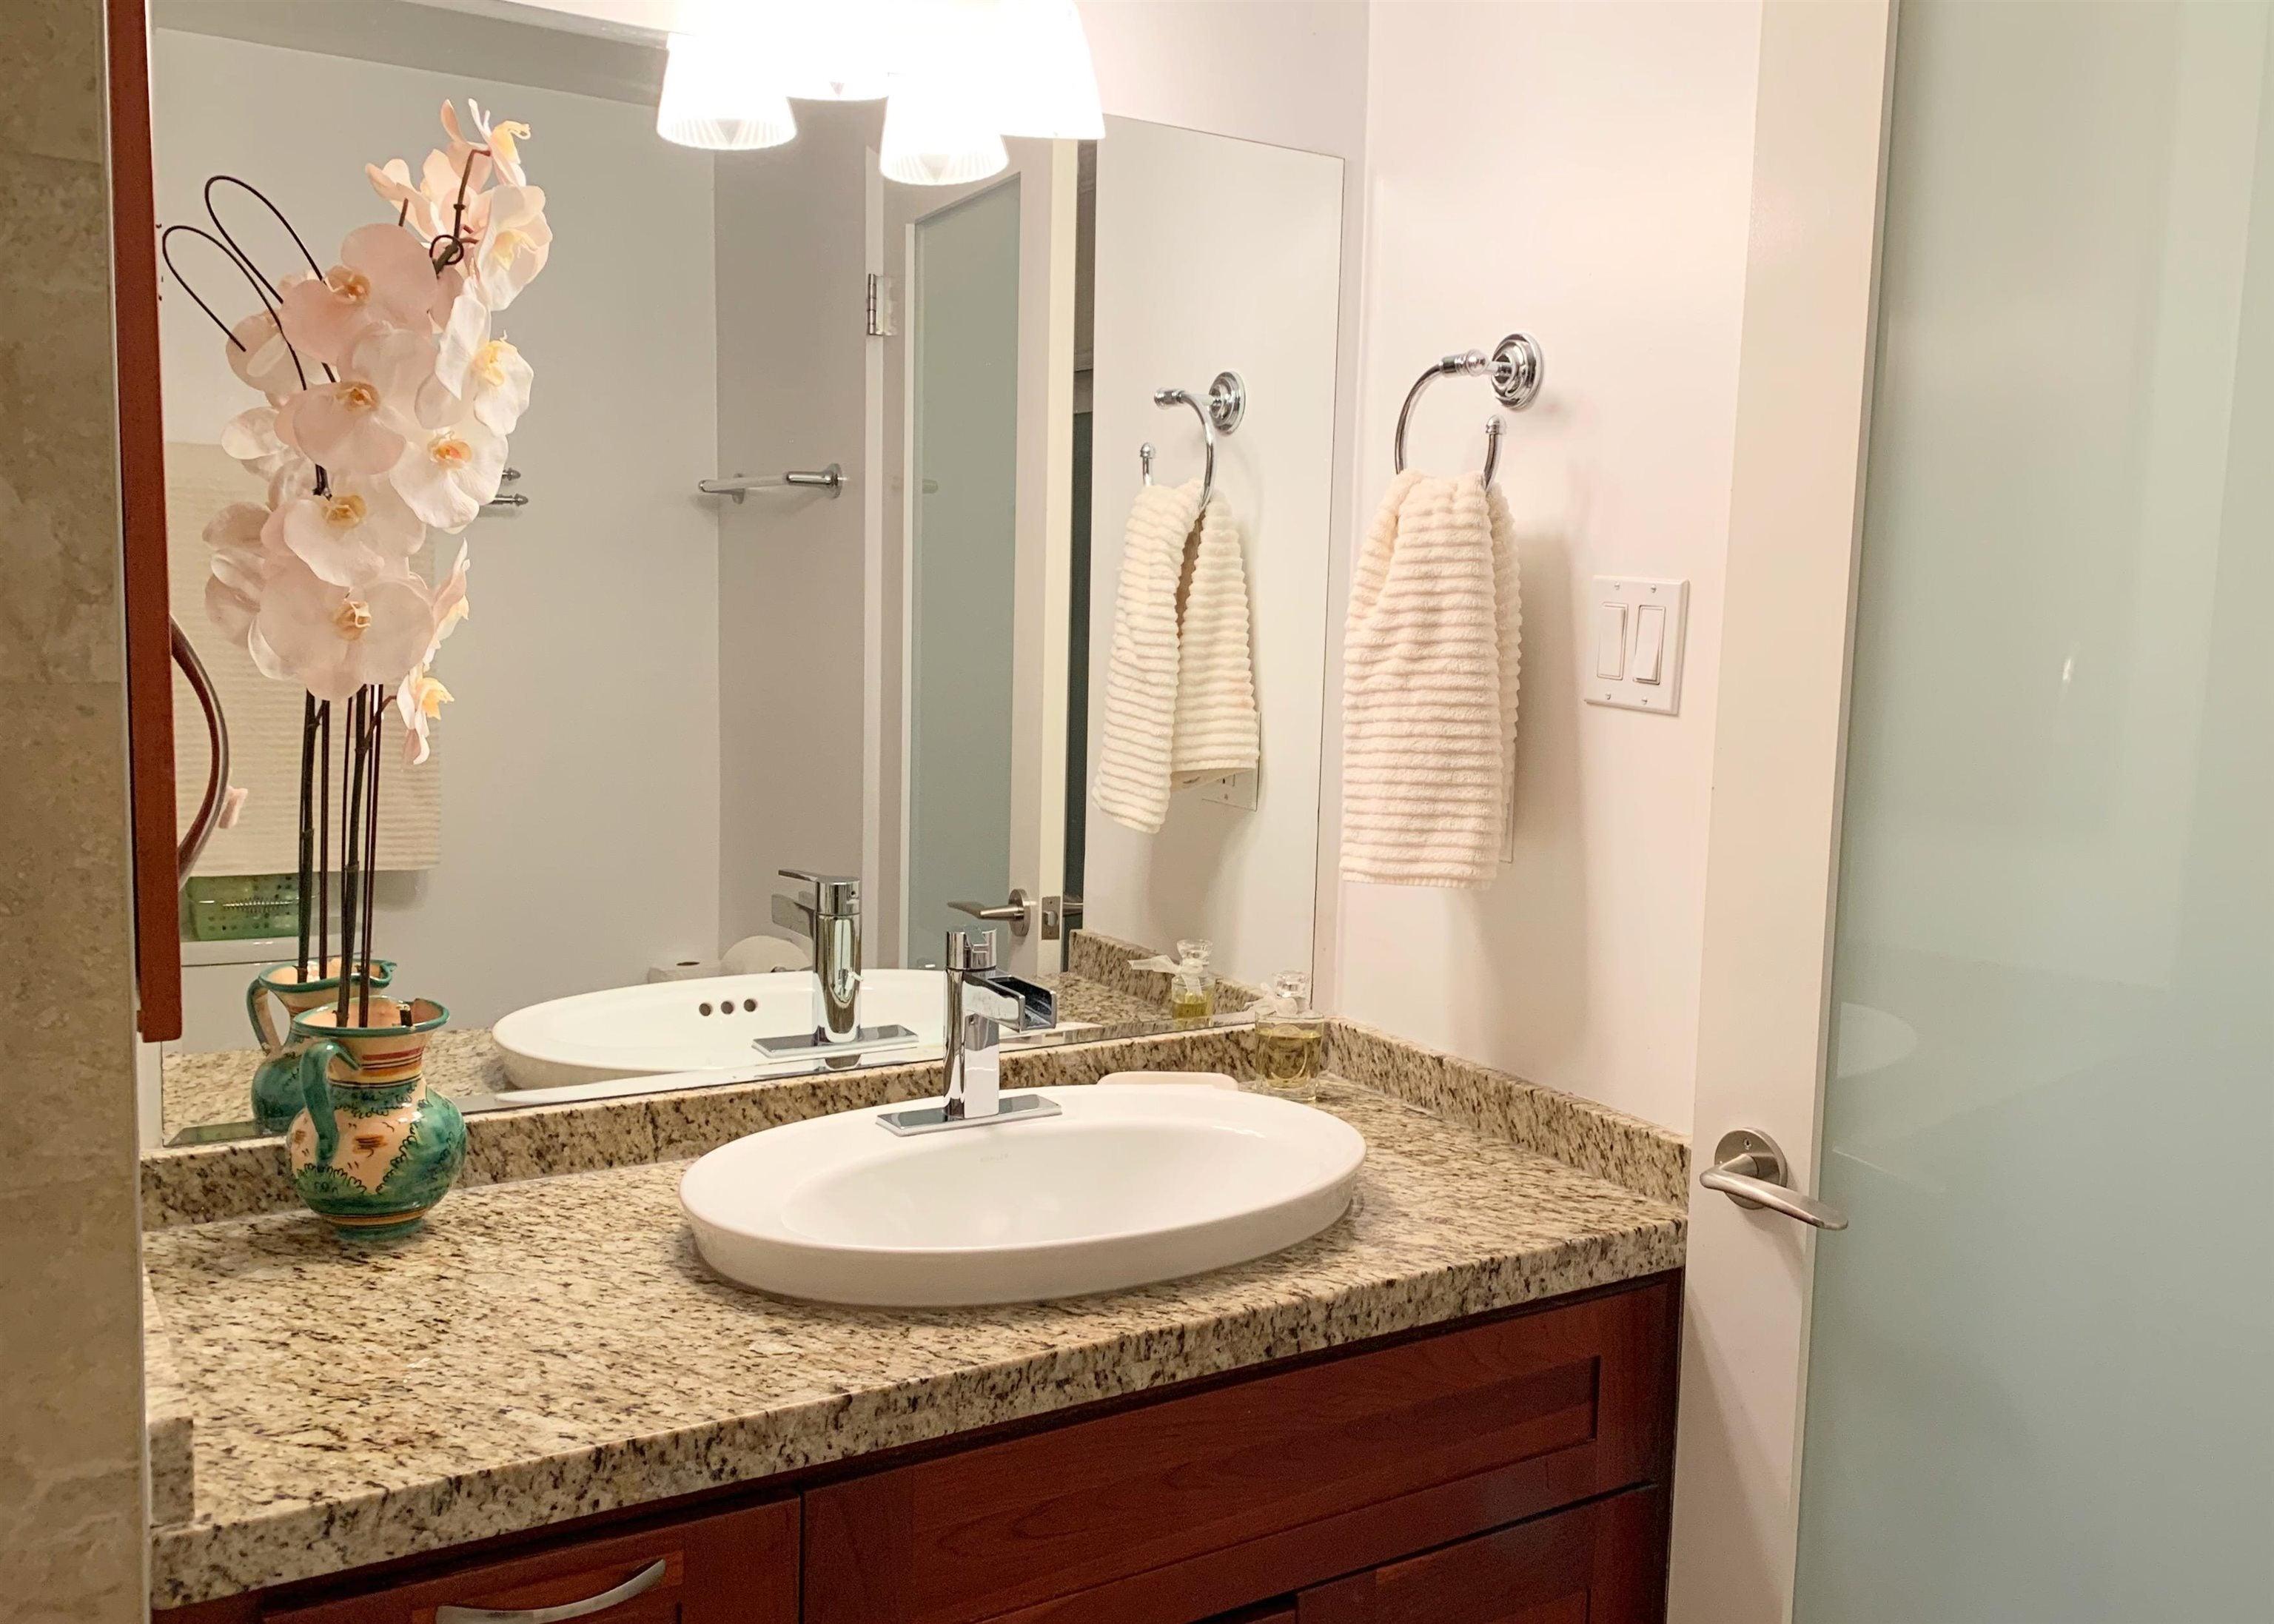 202 1750 ESQUIMALT AVENUE - Ambleside Apartment/Condo for sale, 1 Bedroom (R2610188) - #19